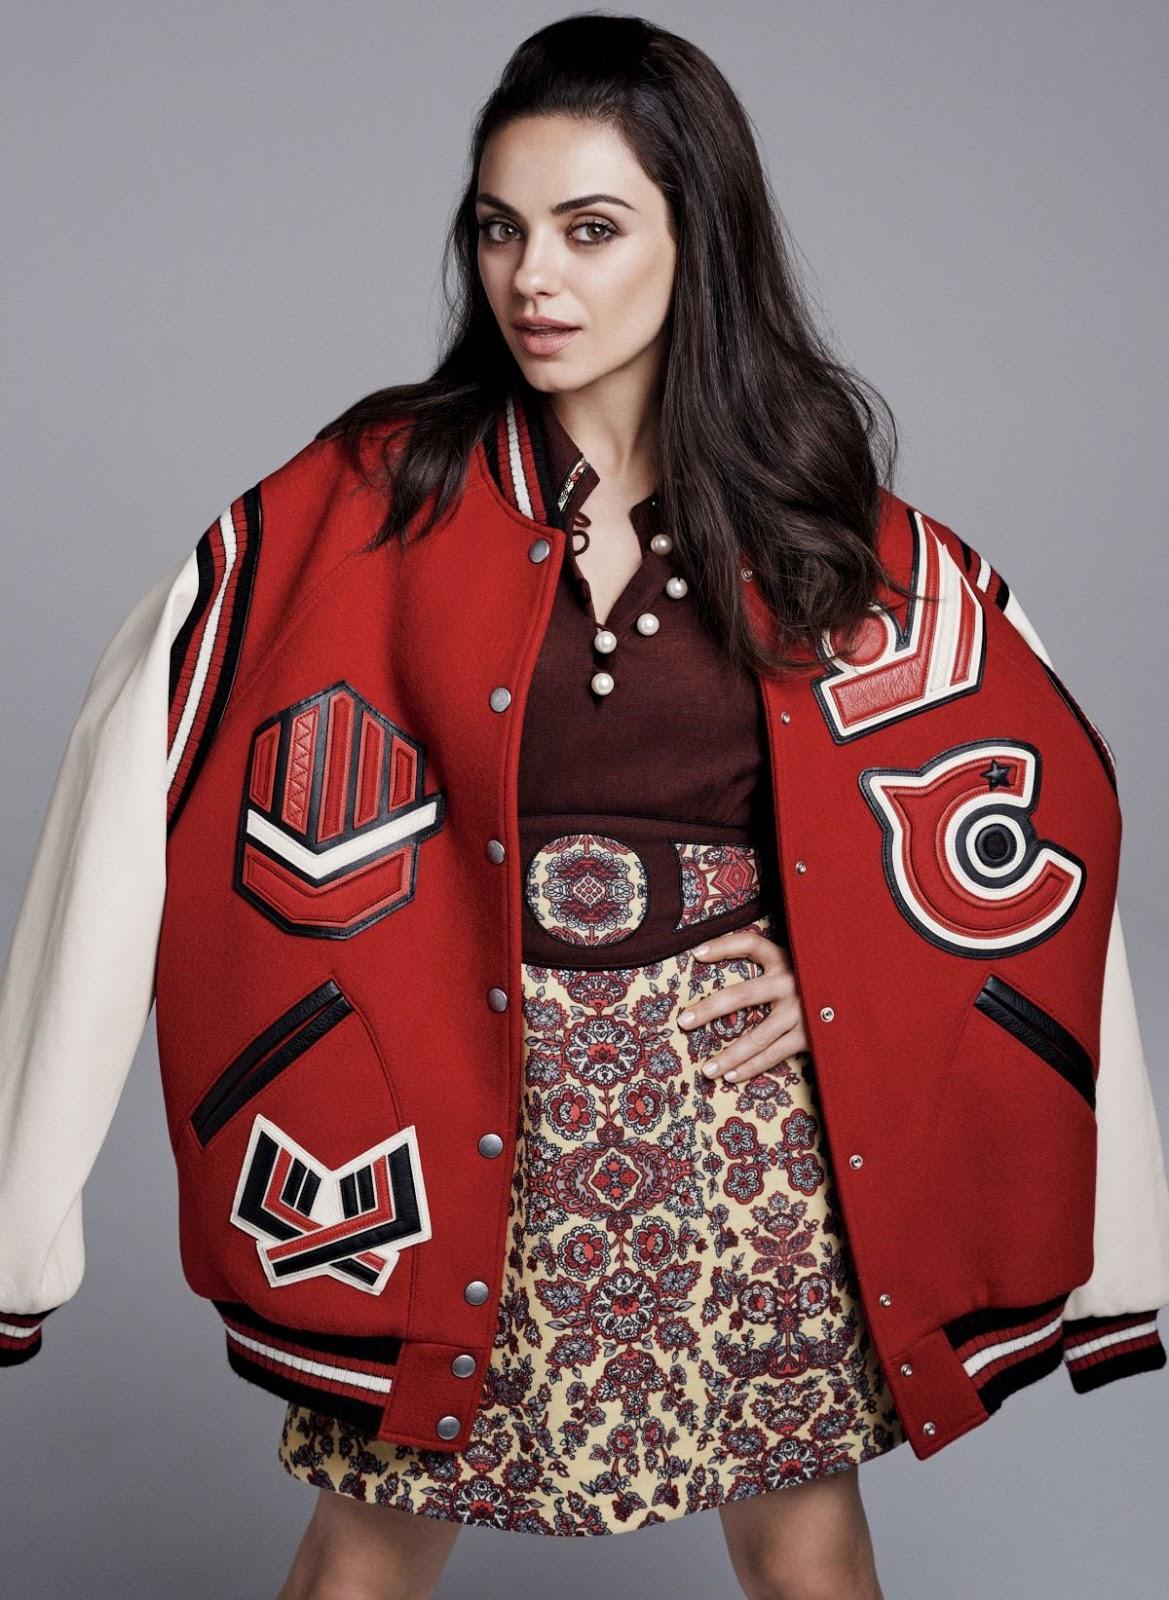 HQ Photos of Mila Kunis PhotoShoot for Glamour Magazine August